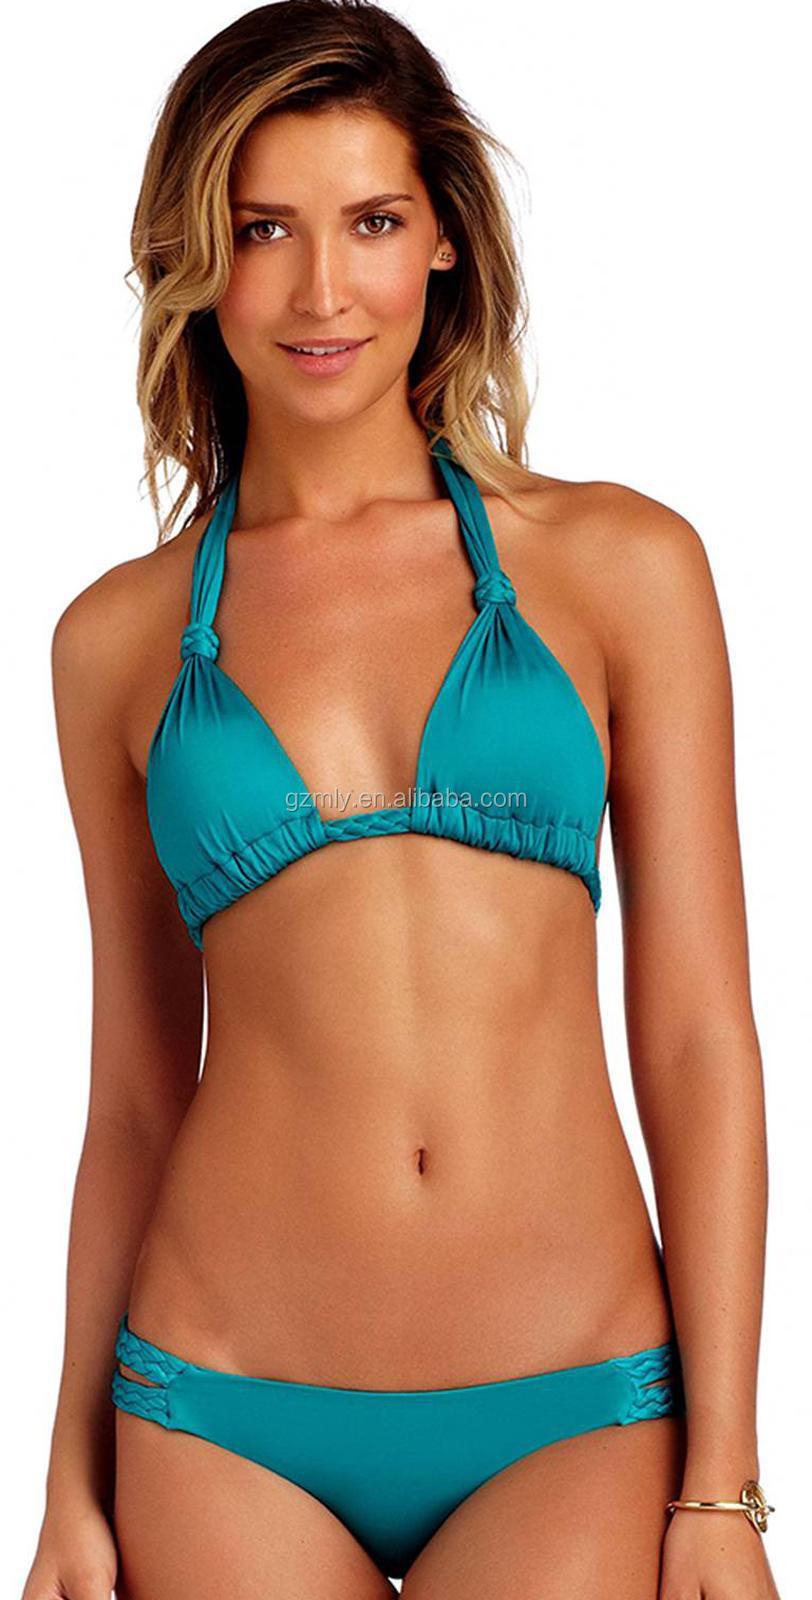 Dental Fotos Dos bikini Bikini Noche Buy Piezas Noche dos Hilo Bikini Product On 8PnwOk0NXZ